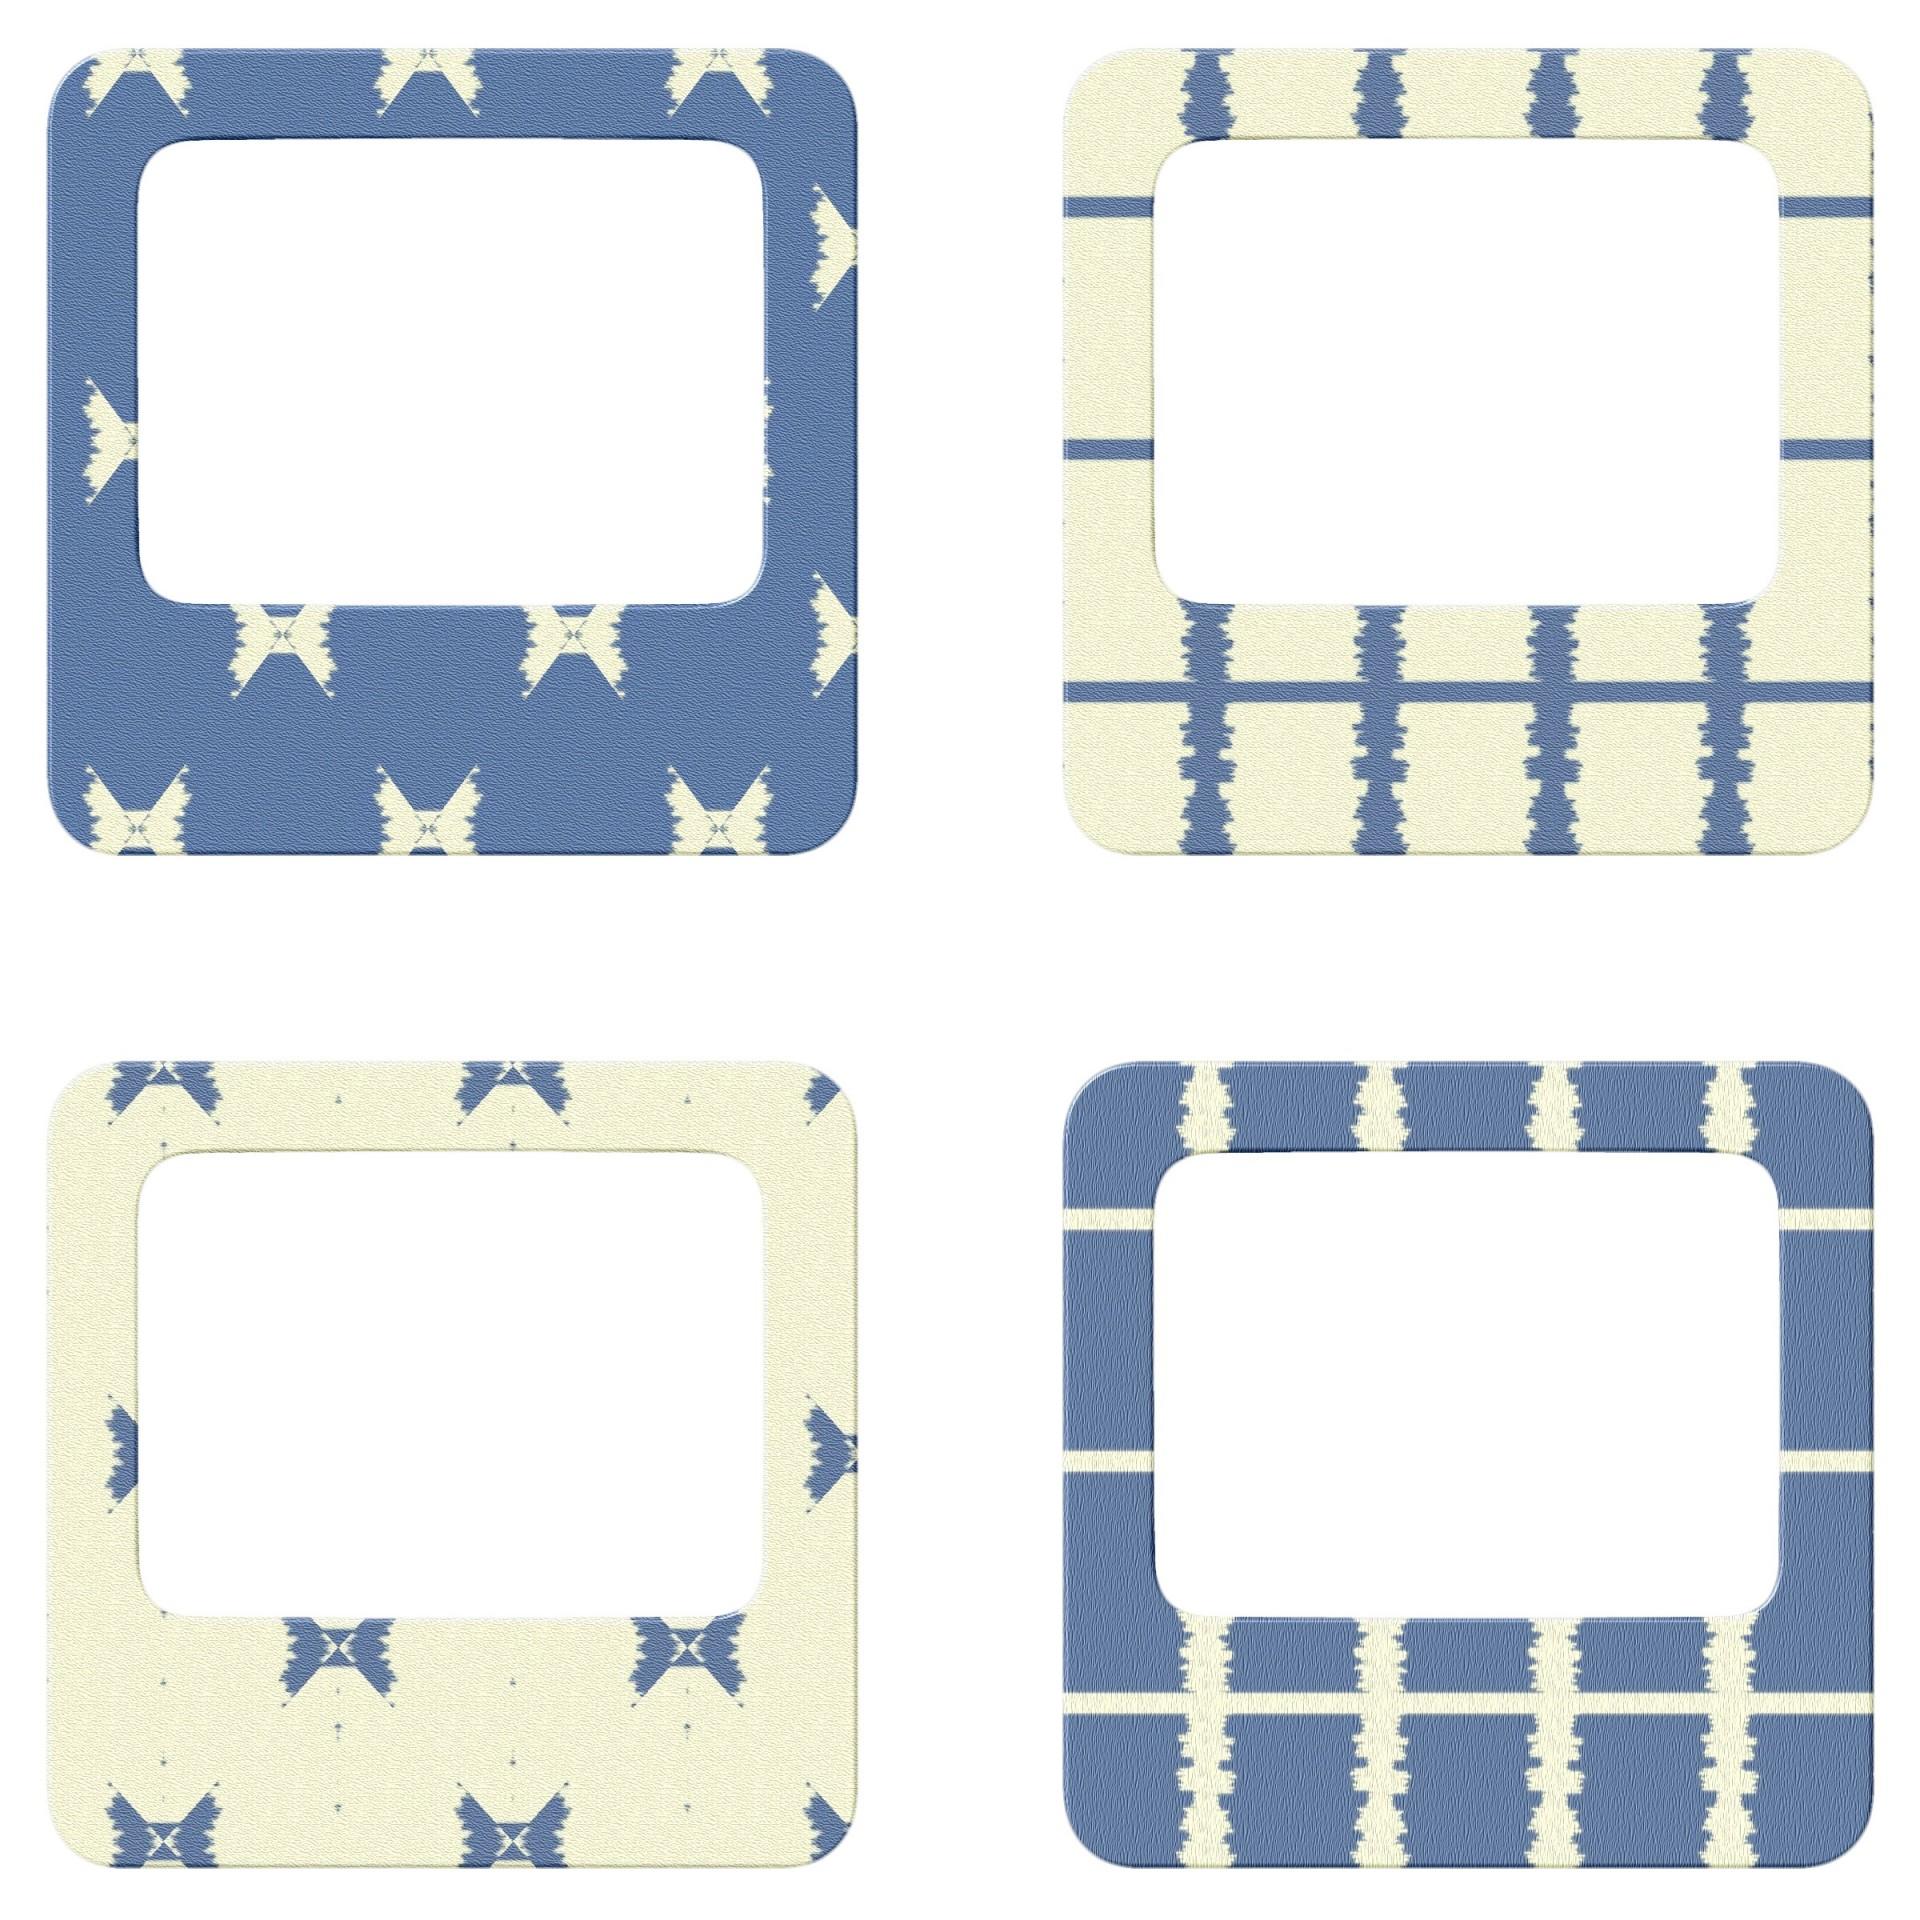 Scrapbooking,frames,blue,4 mini frames # 2,free pictures